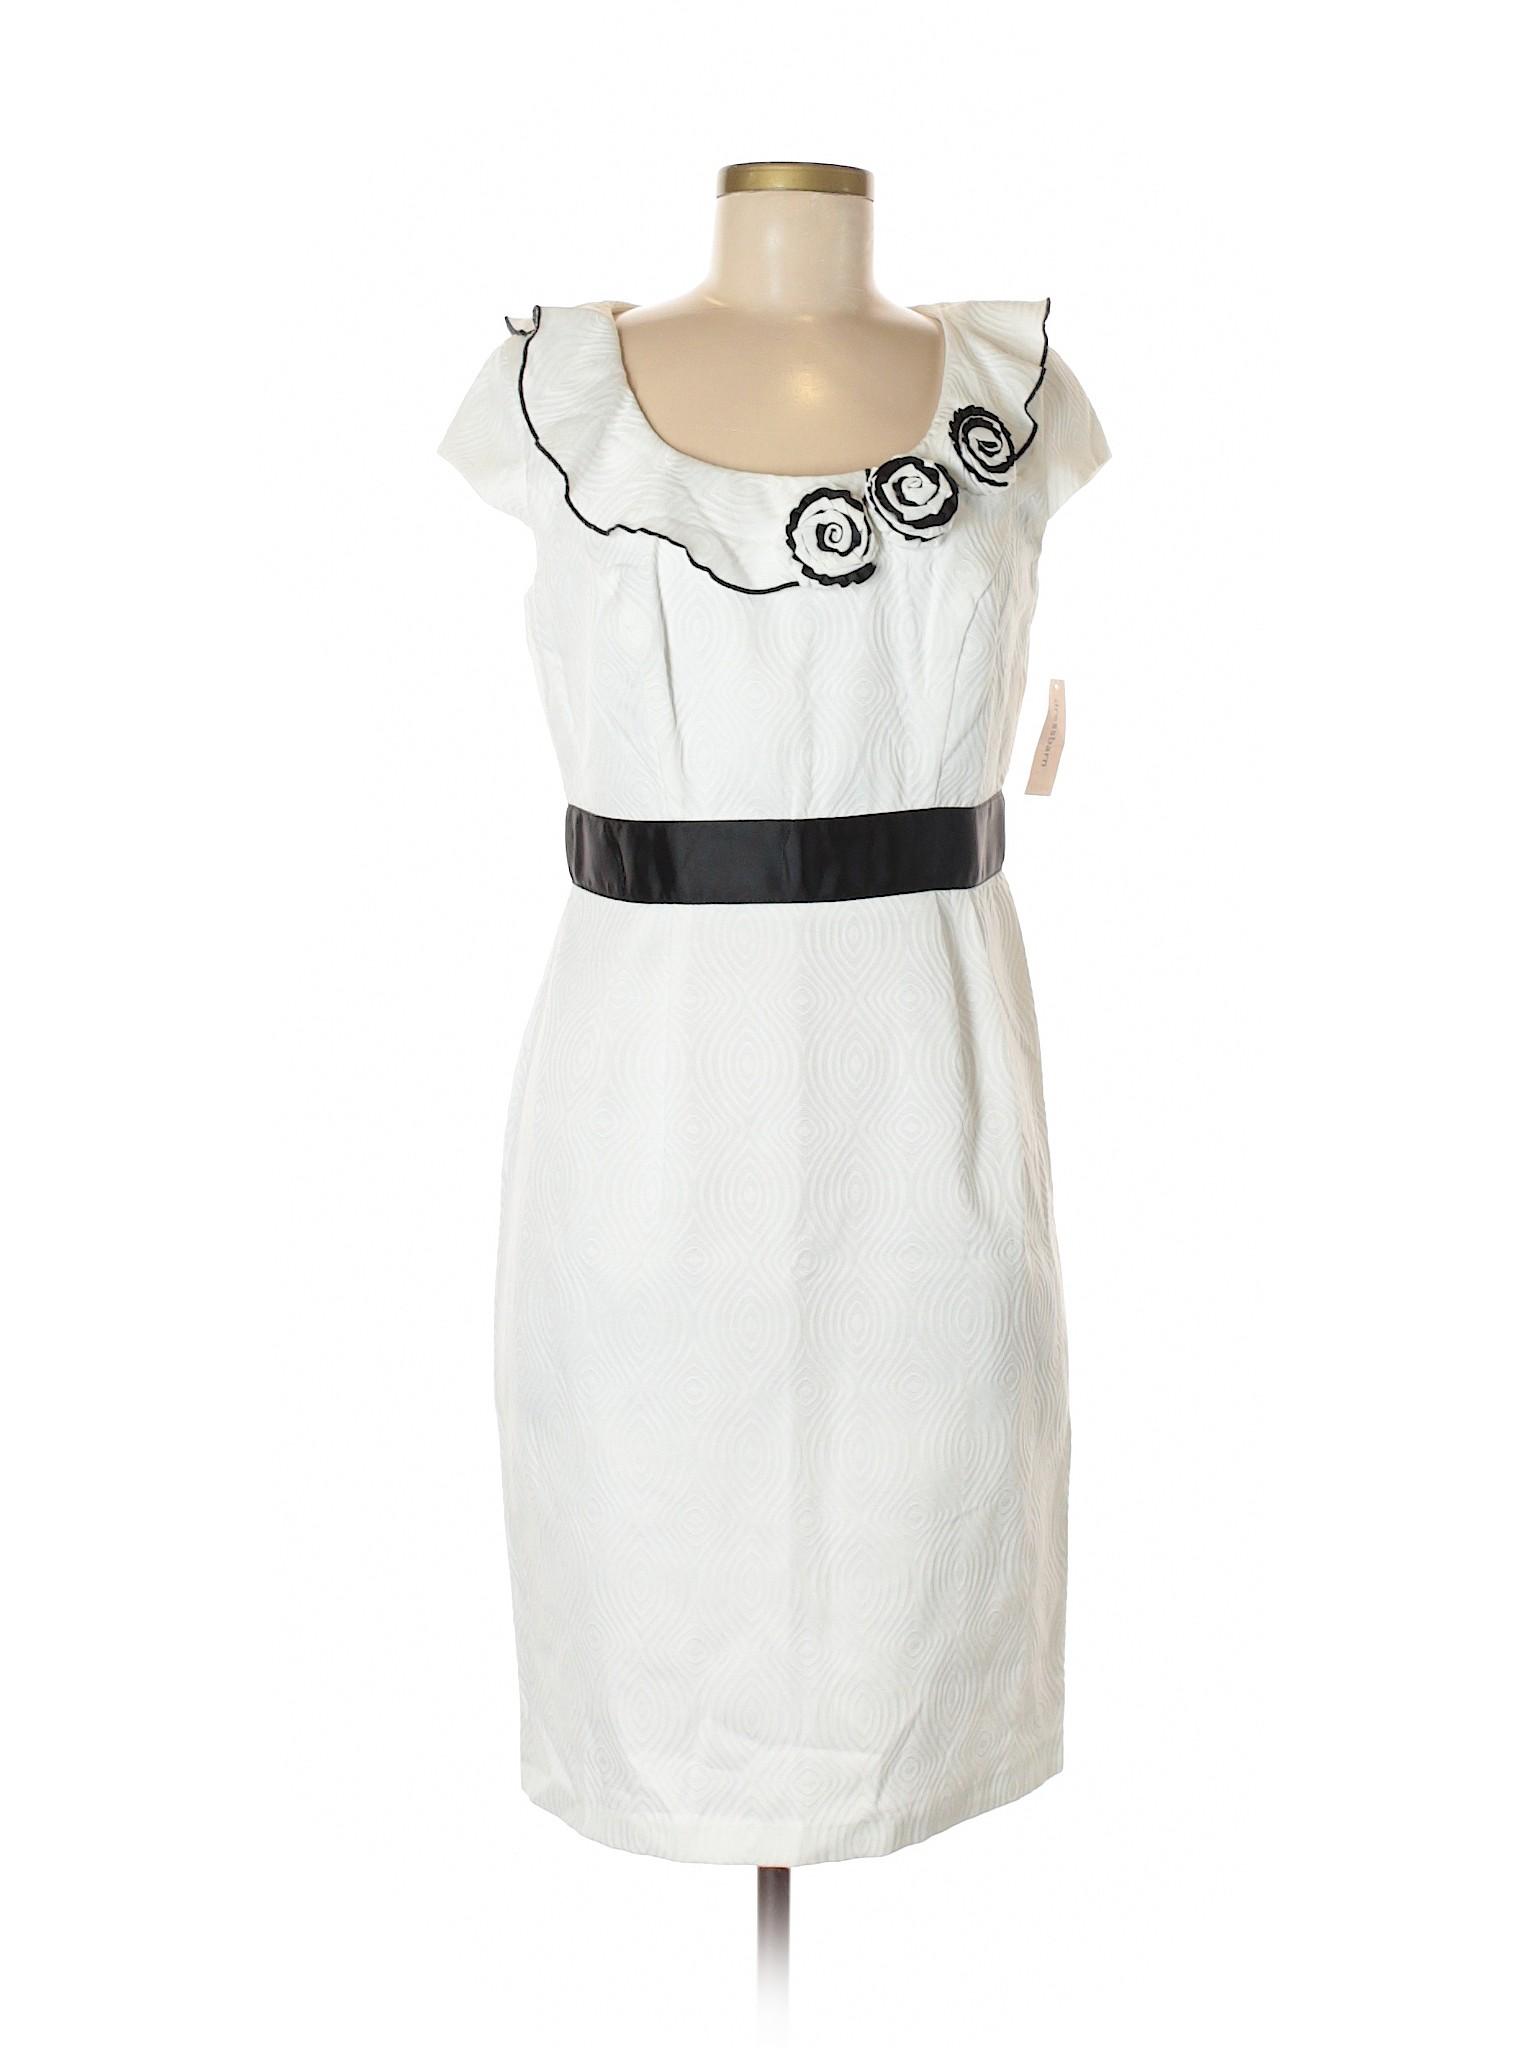 Boutique DressBarn Boutique Dress Casual winter winter Casual DressBarn Dress YxwIqE